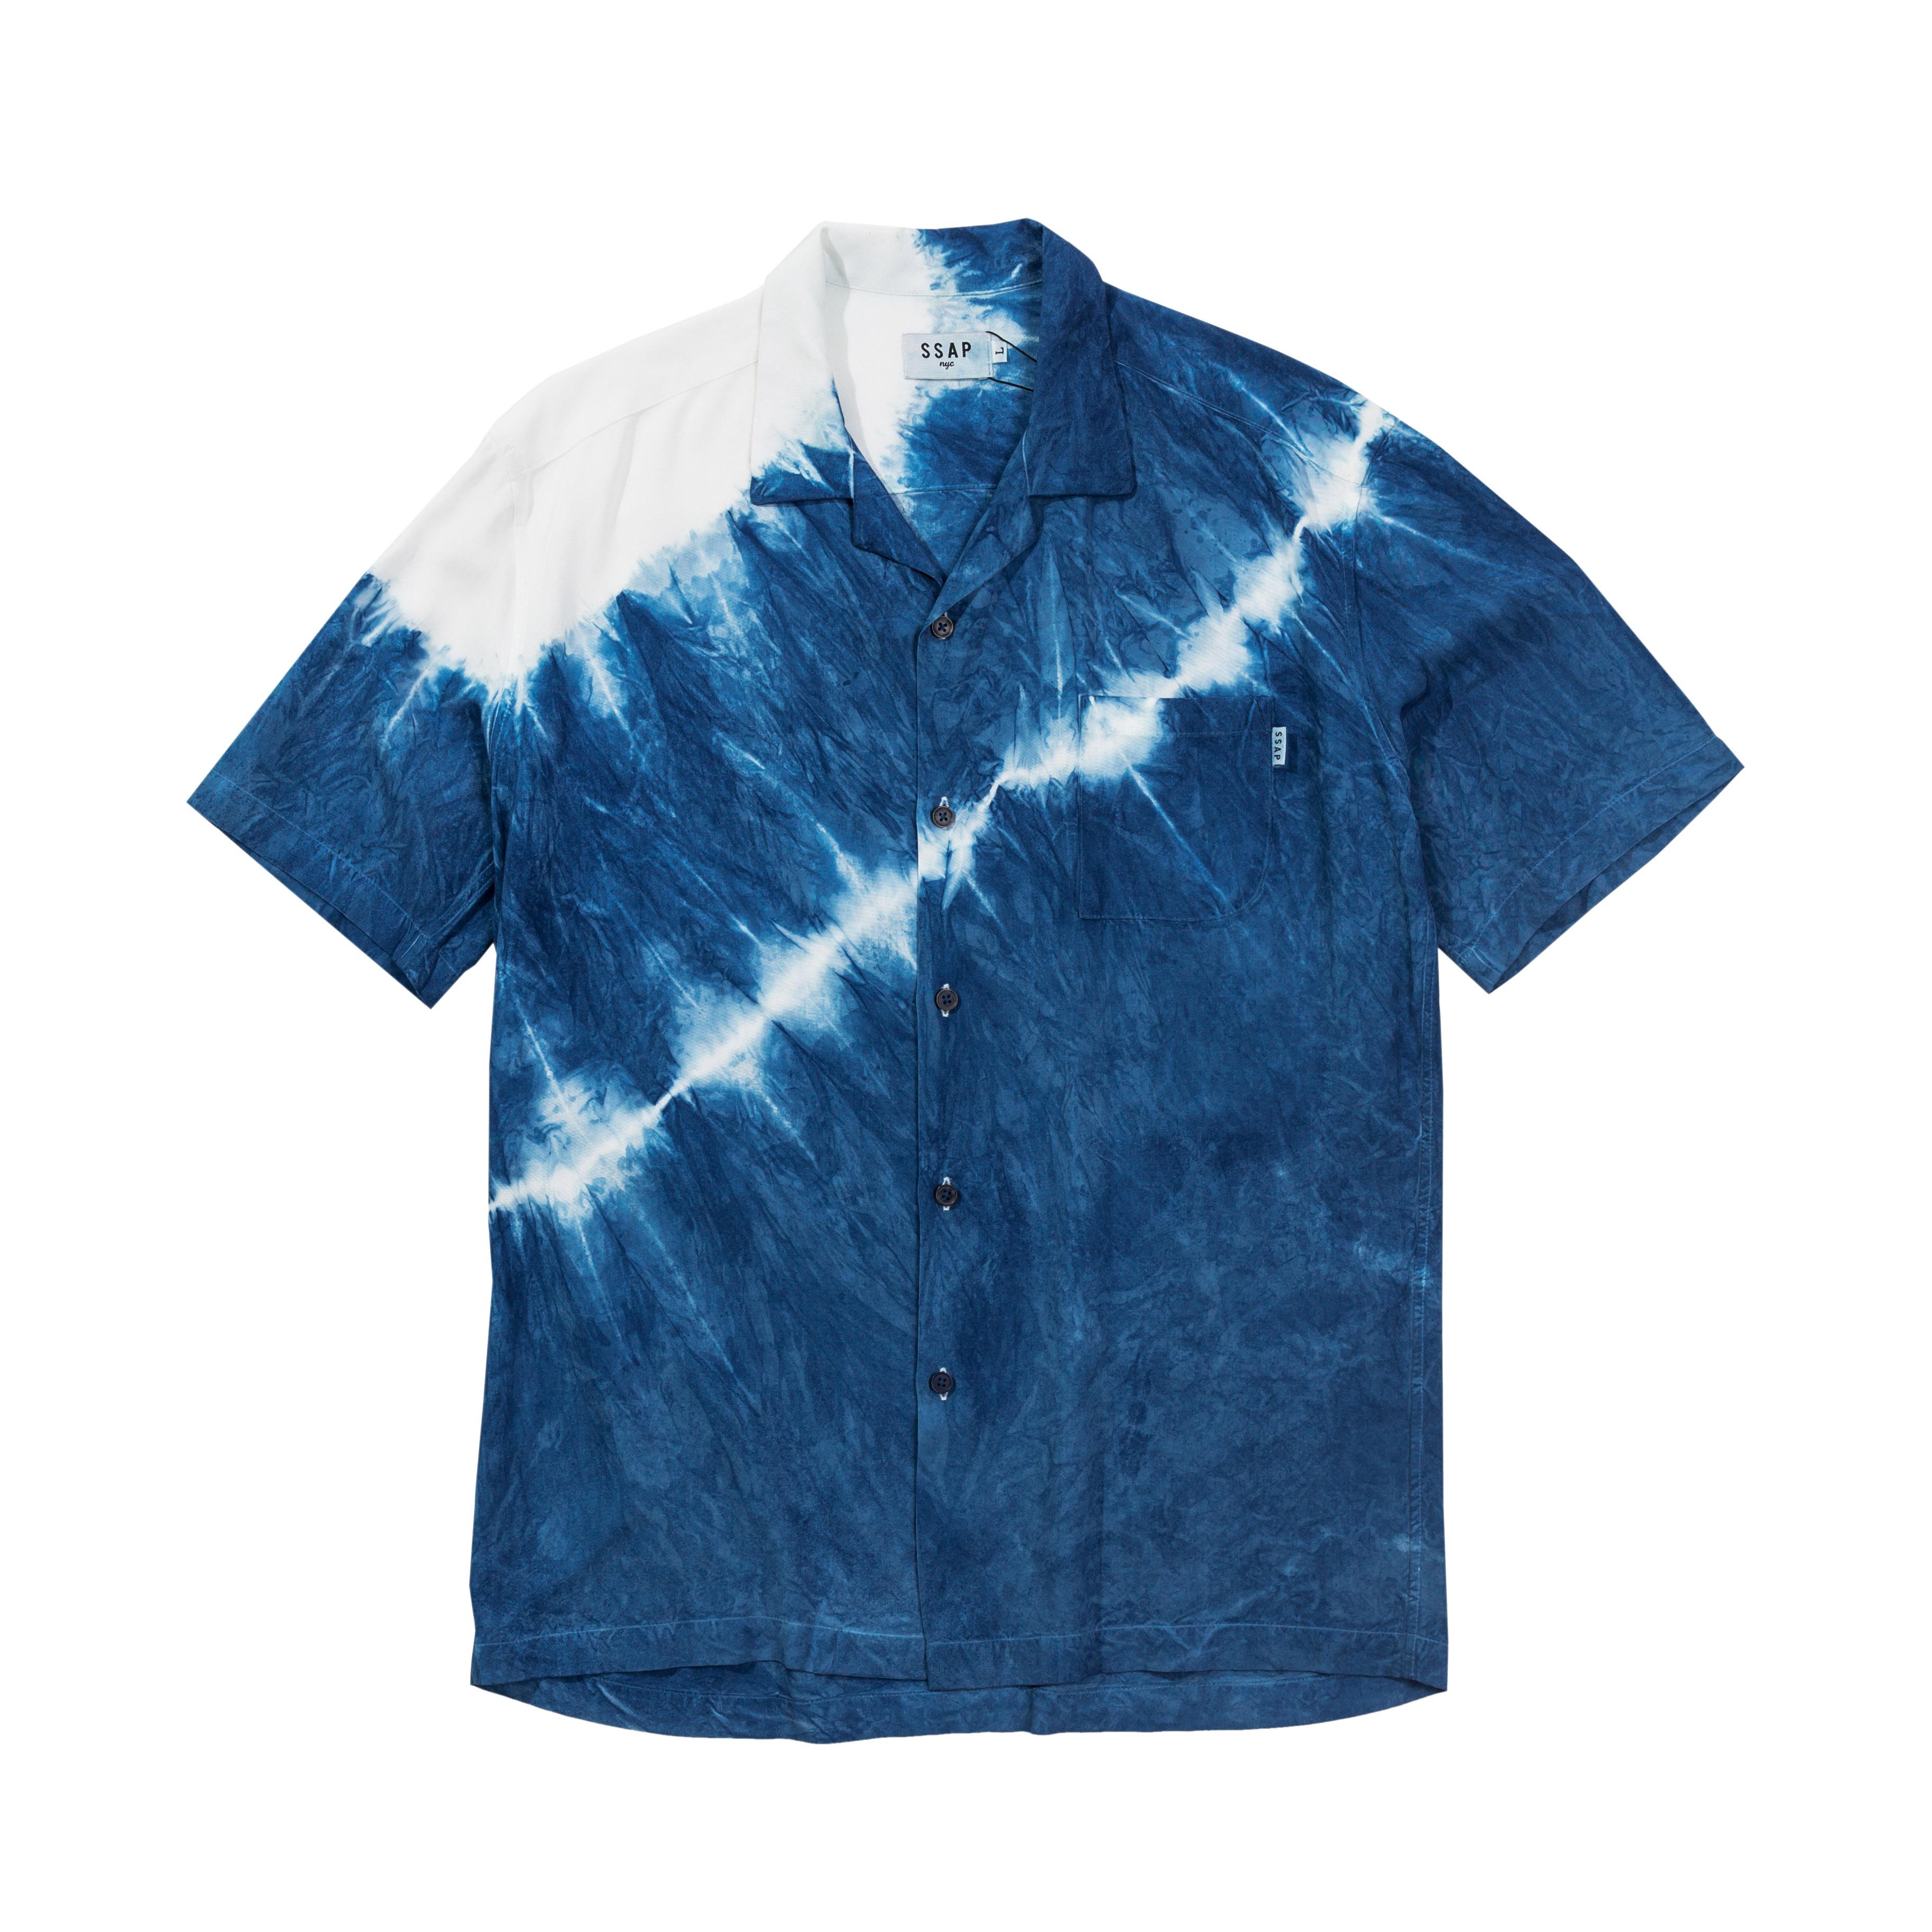 SSAP BLUE TIE-DYE SHIRT